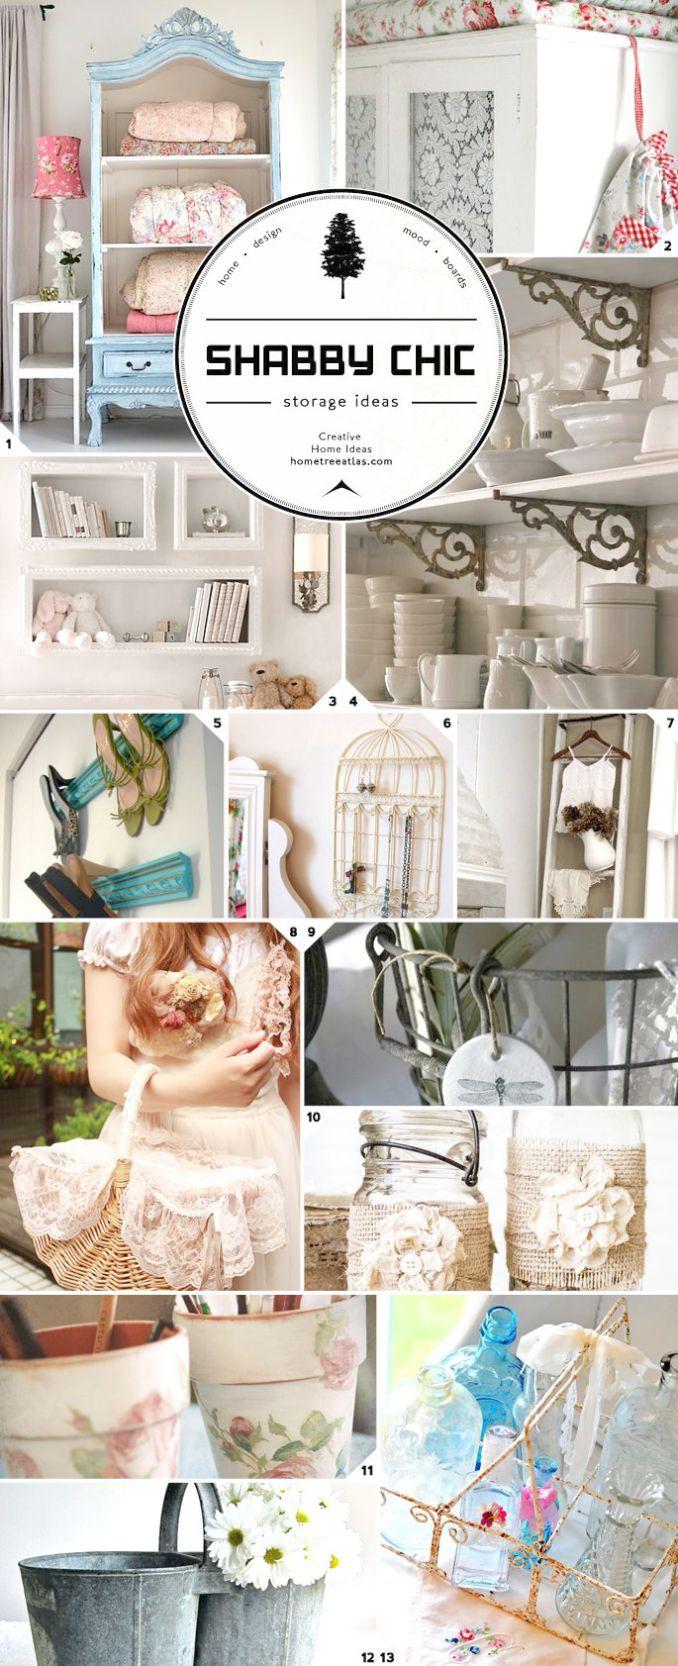 Home Decor Ideas Ireland Because Shabby Chic Outfit Ideas Shabby